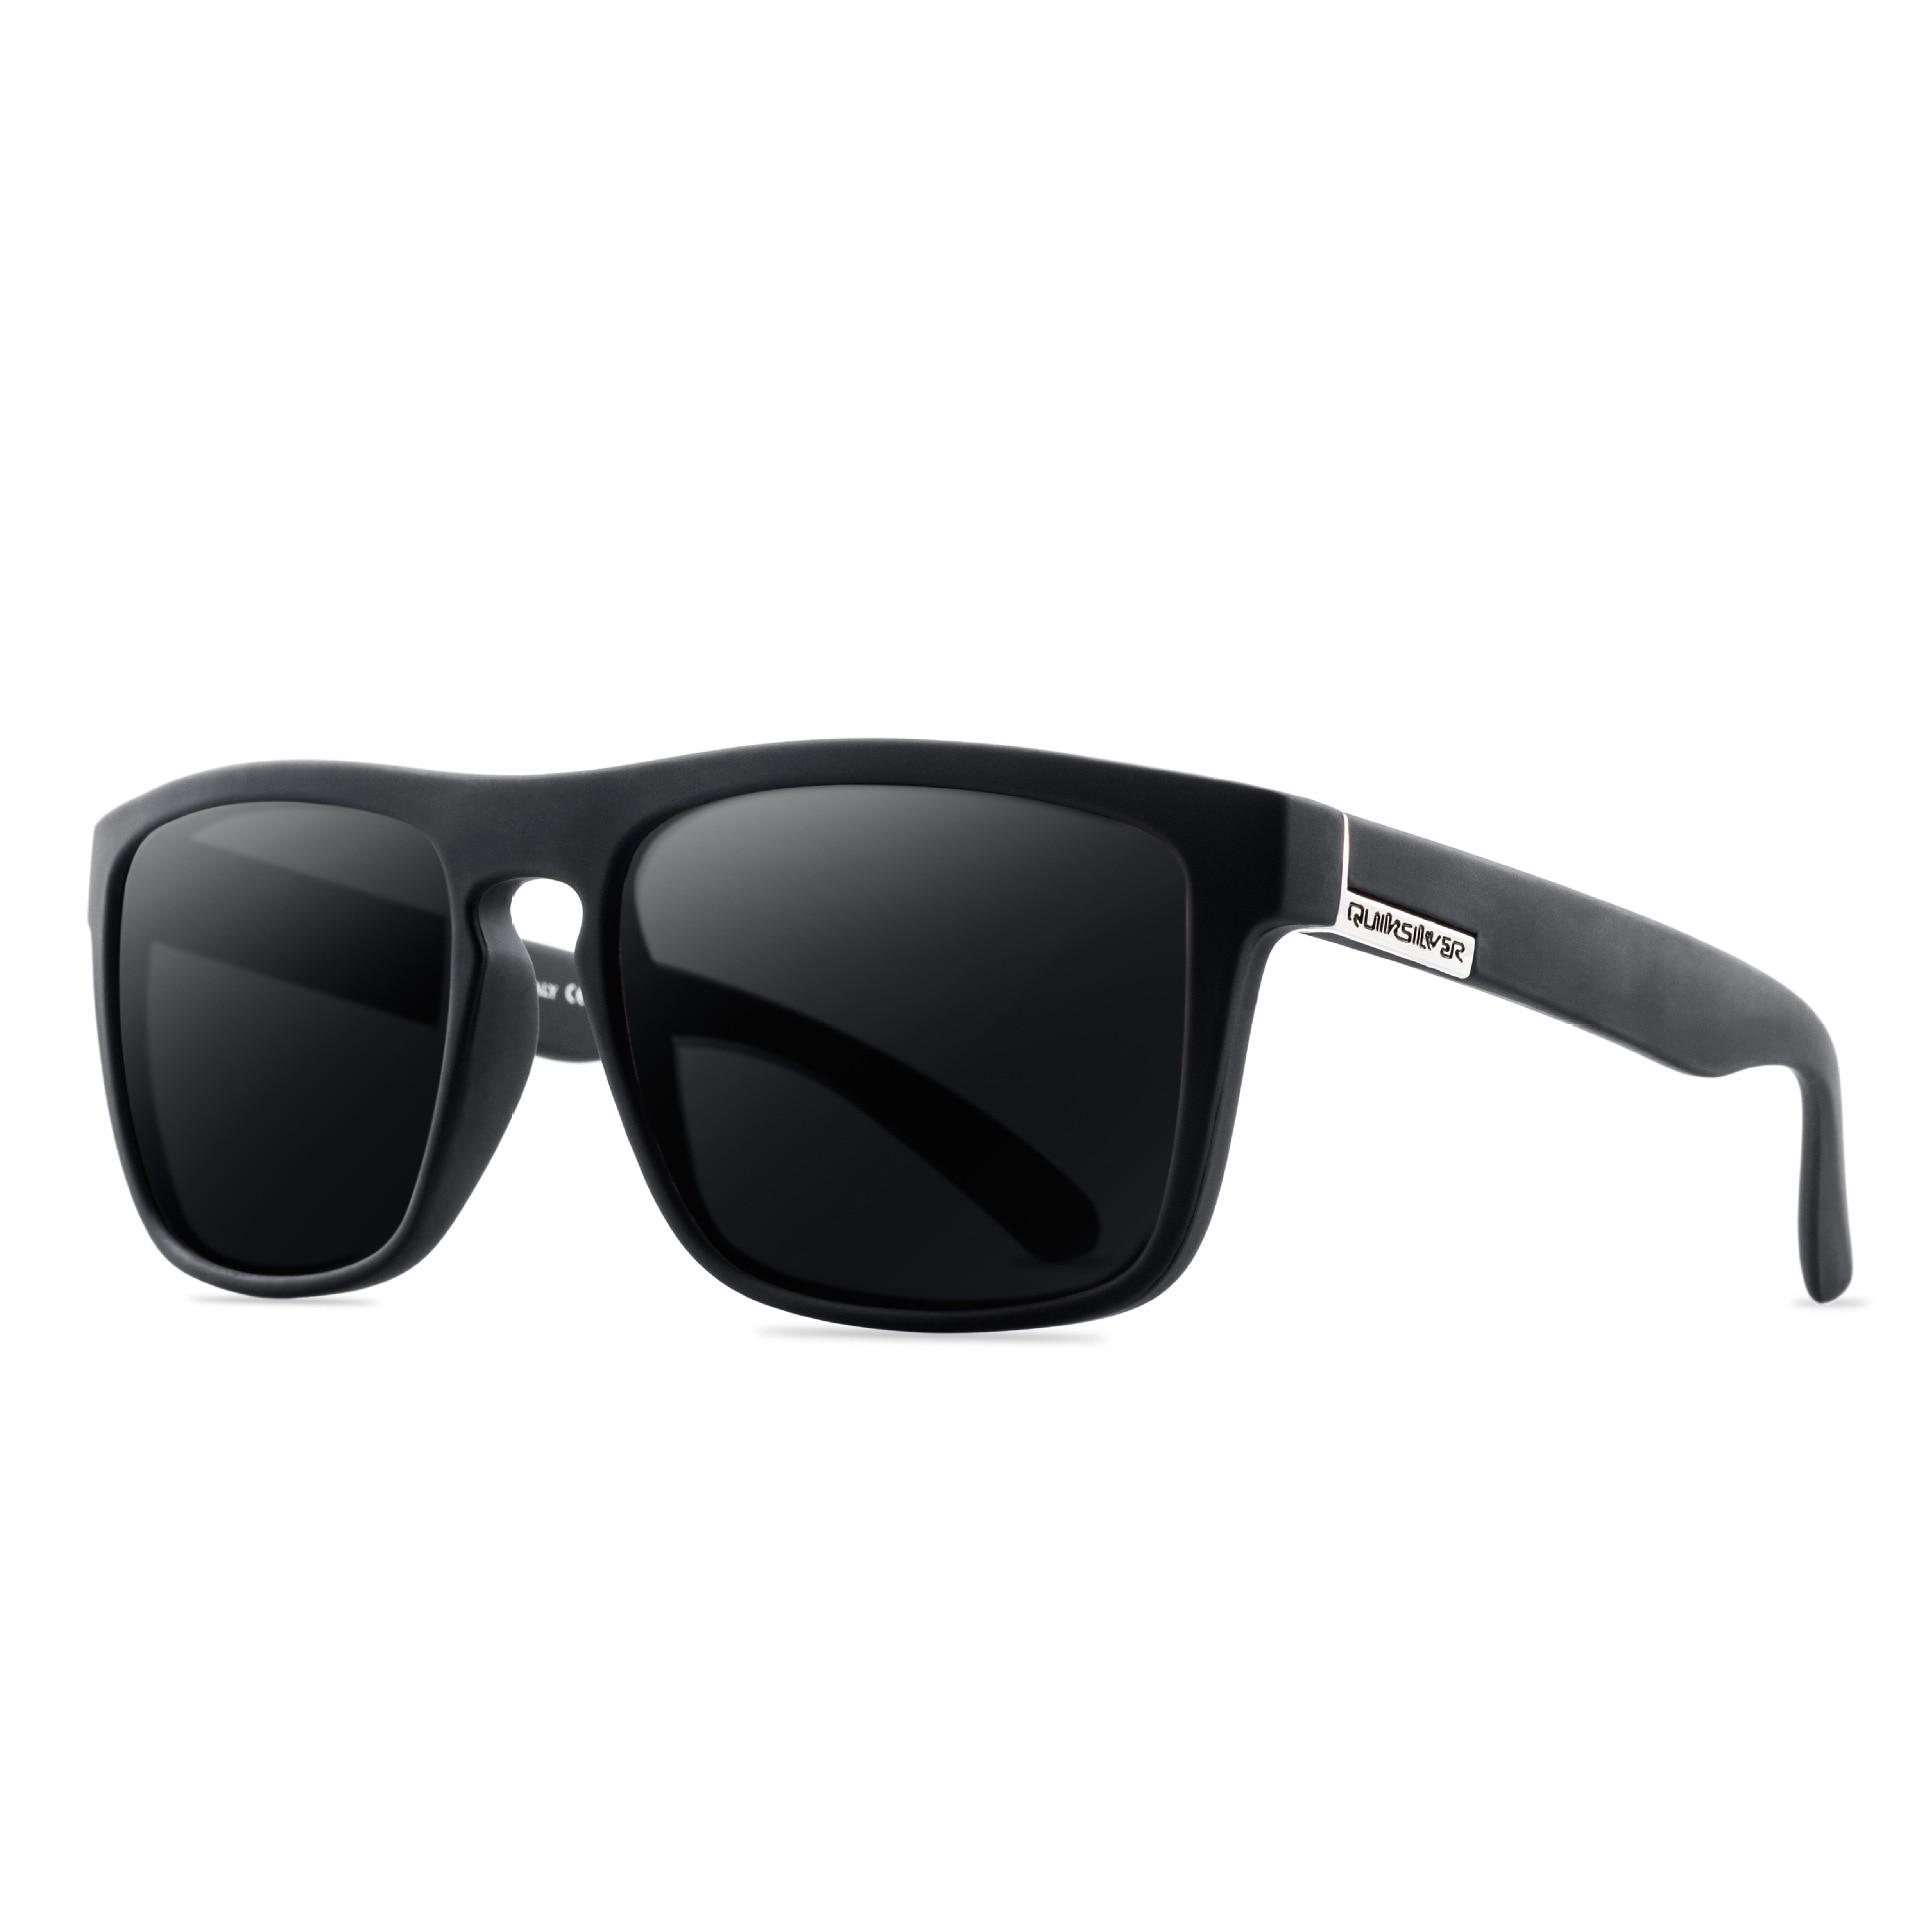 2019 Square Oversized Sunglasses Men Polarized Driving Fishing Shades Male Sun Glasses for man Retro Luxury Woman UV400 in Men 39 s Sunglasses from Apparel Accessories